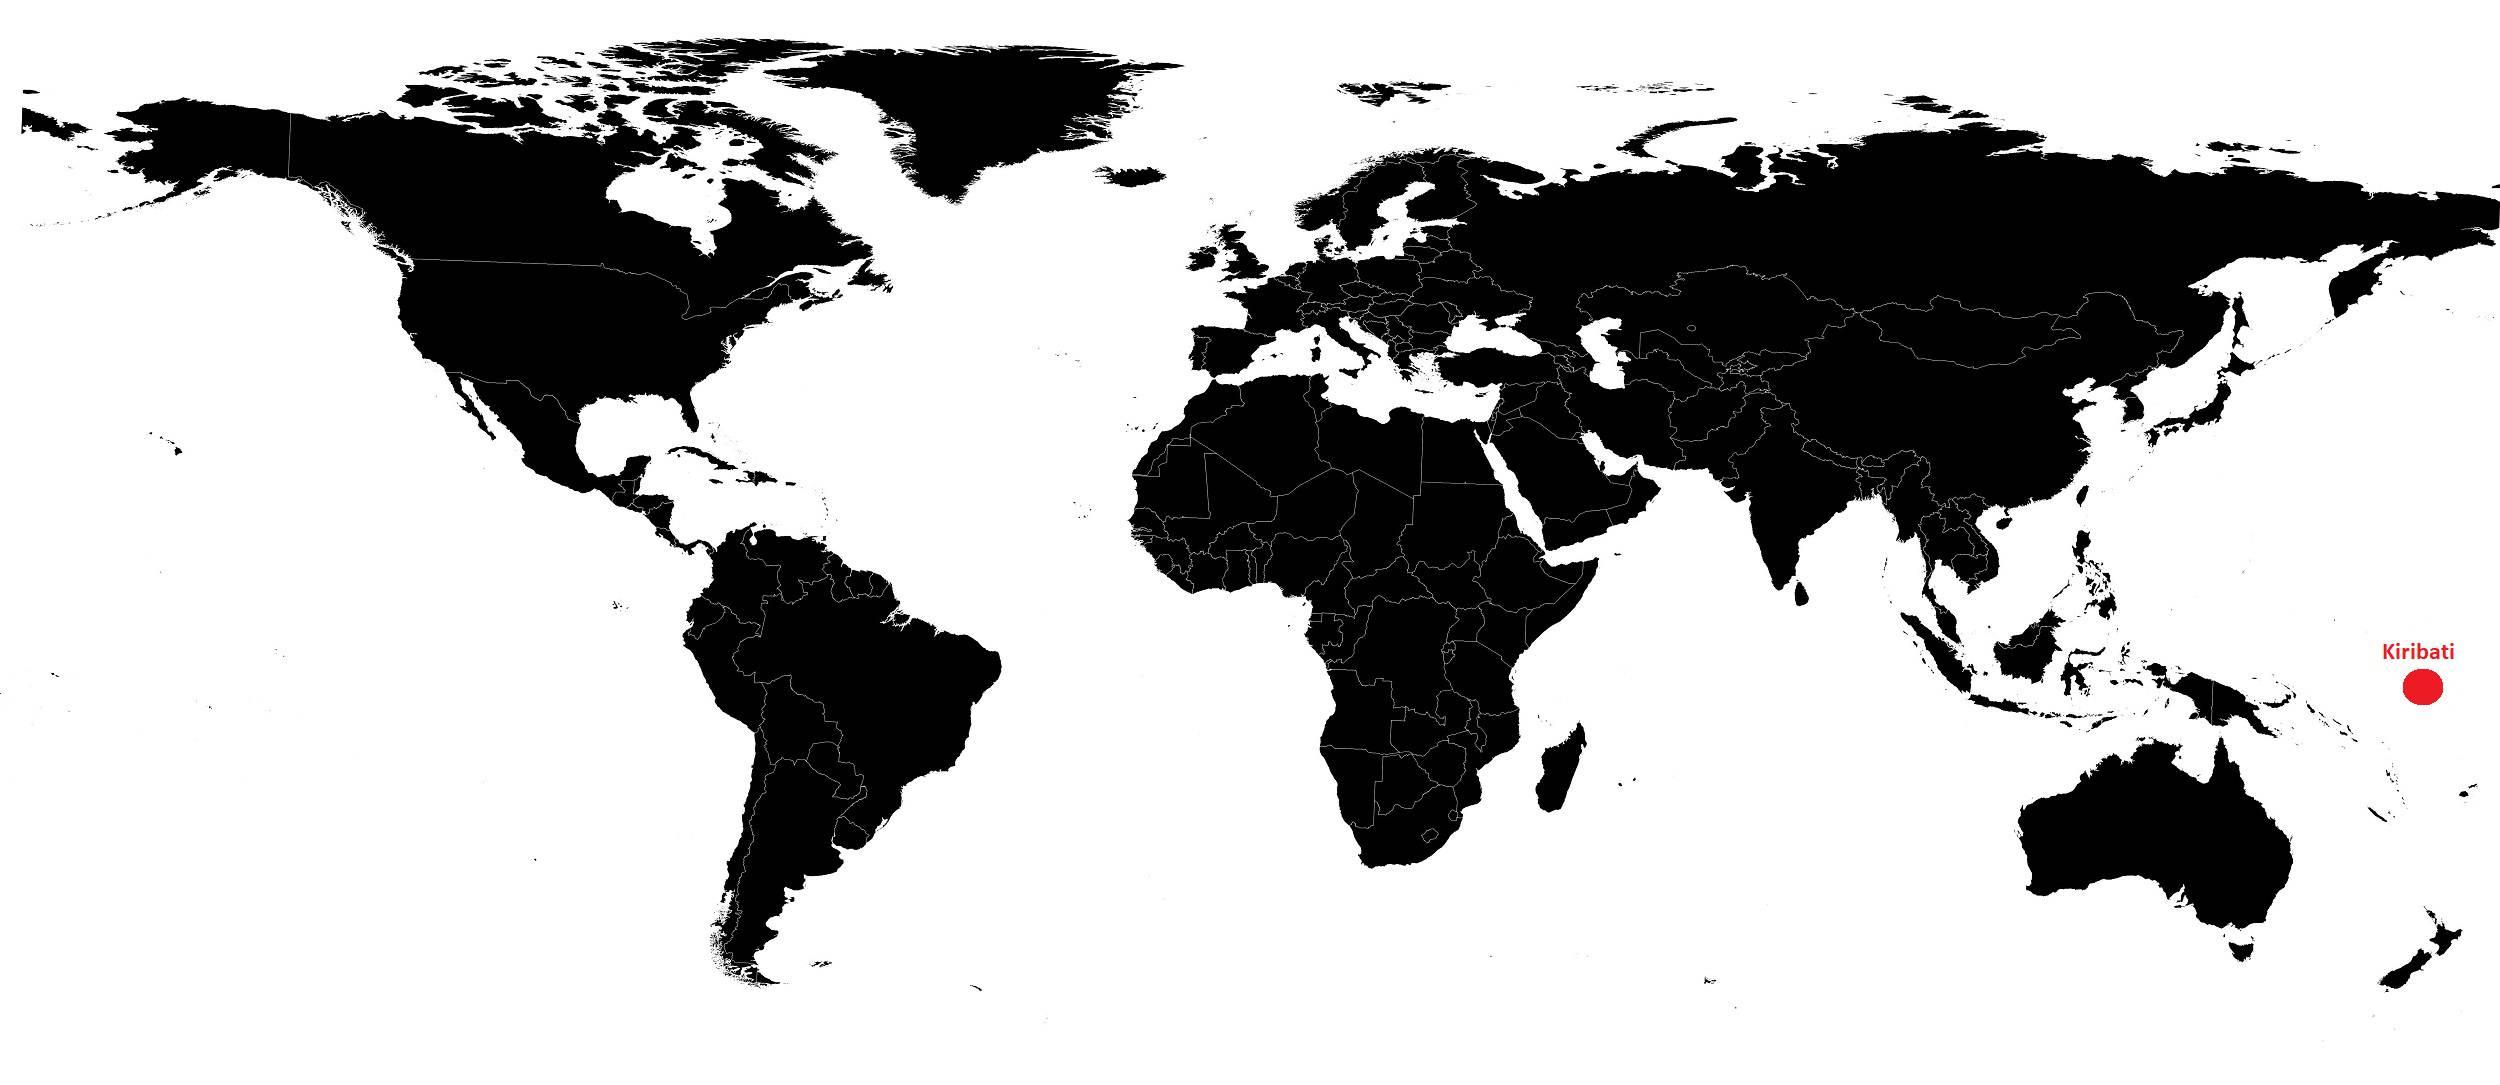 Kiribati sur une carte du monde